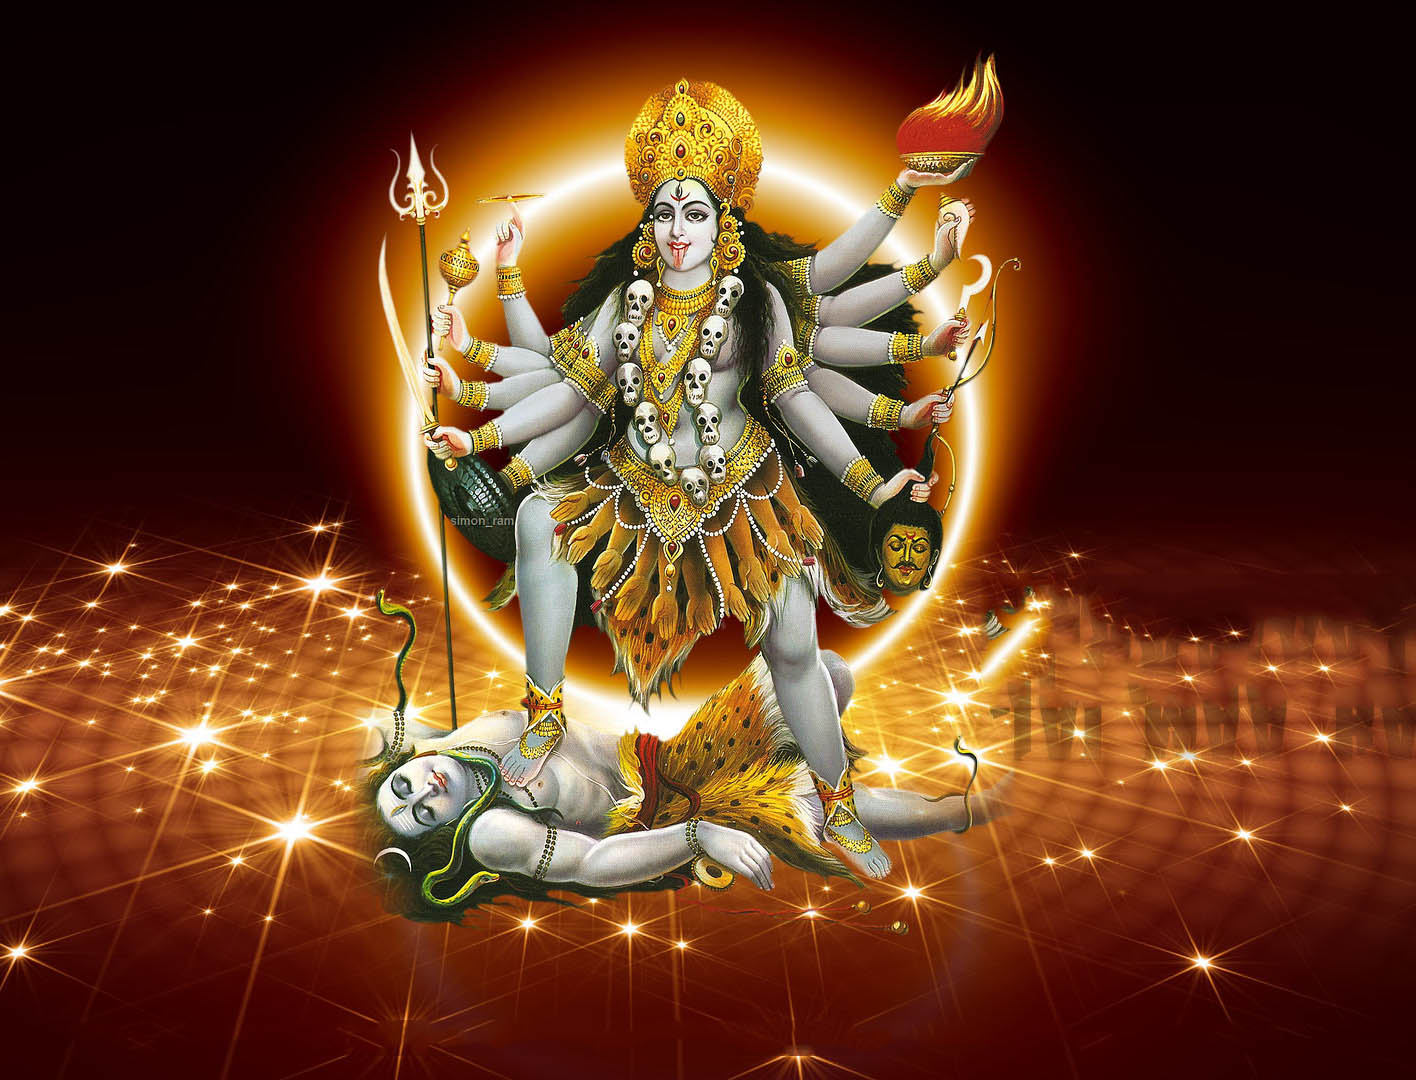 Top Goddess Sri Kali Mata Wallpapers for free download